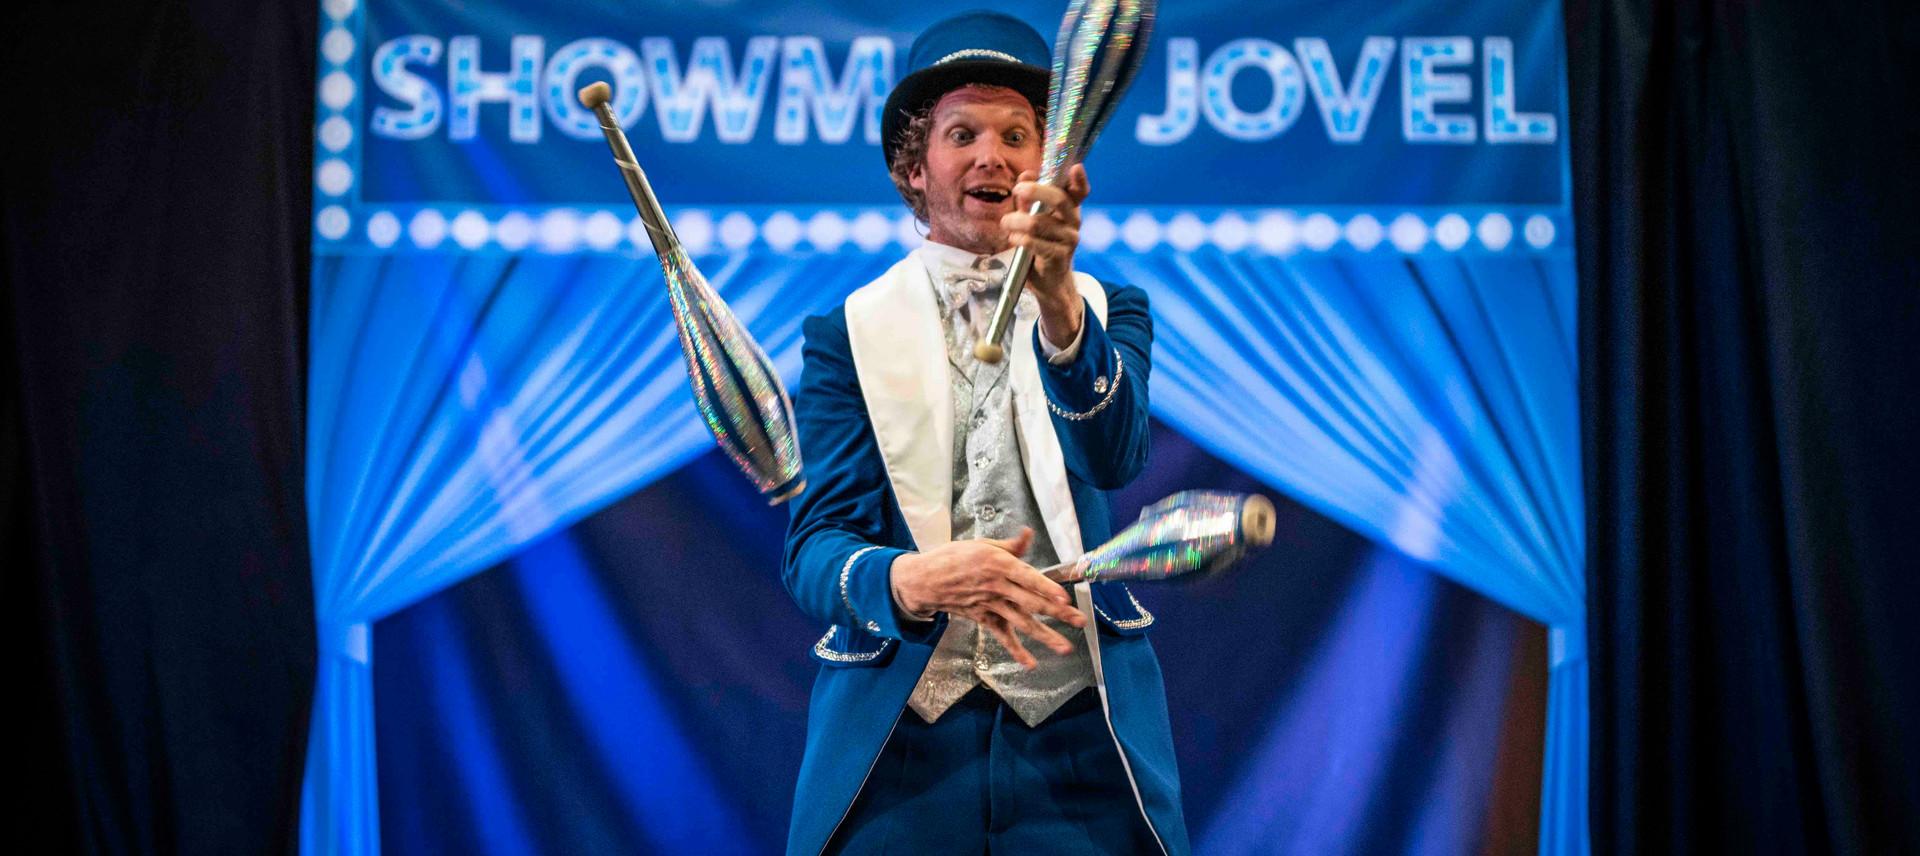 Showman Jovel Jori Veldhuizen entertaine